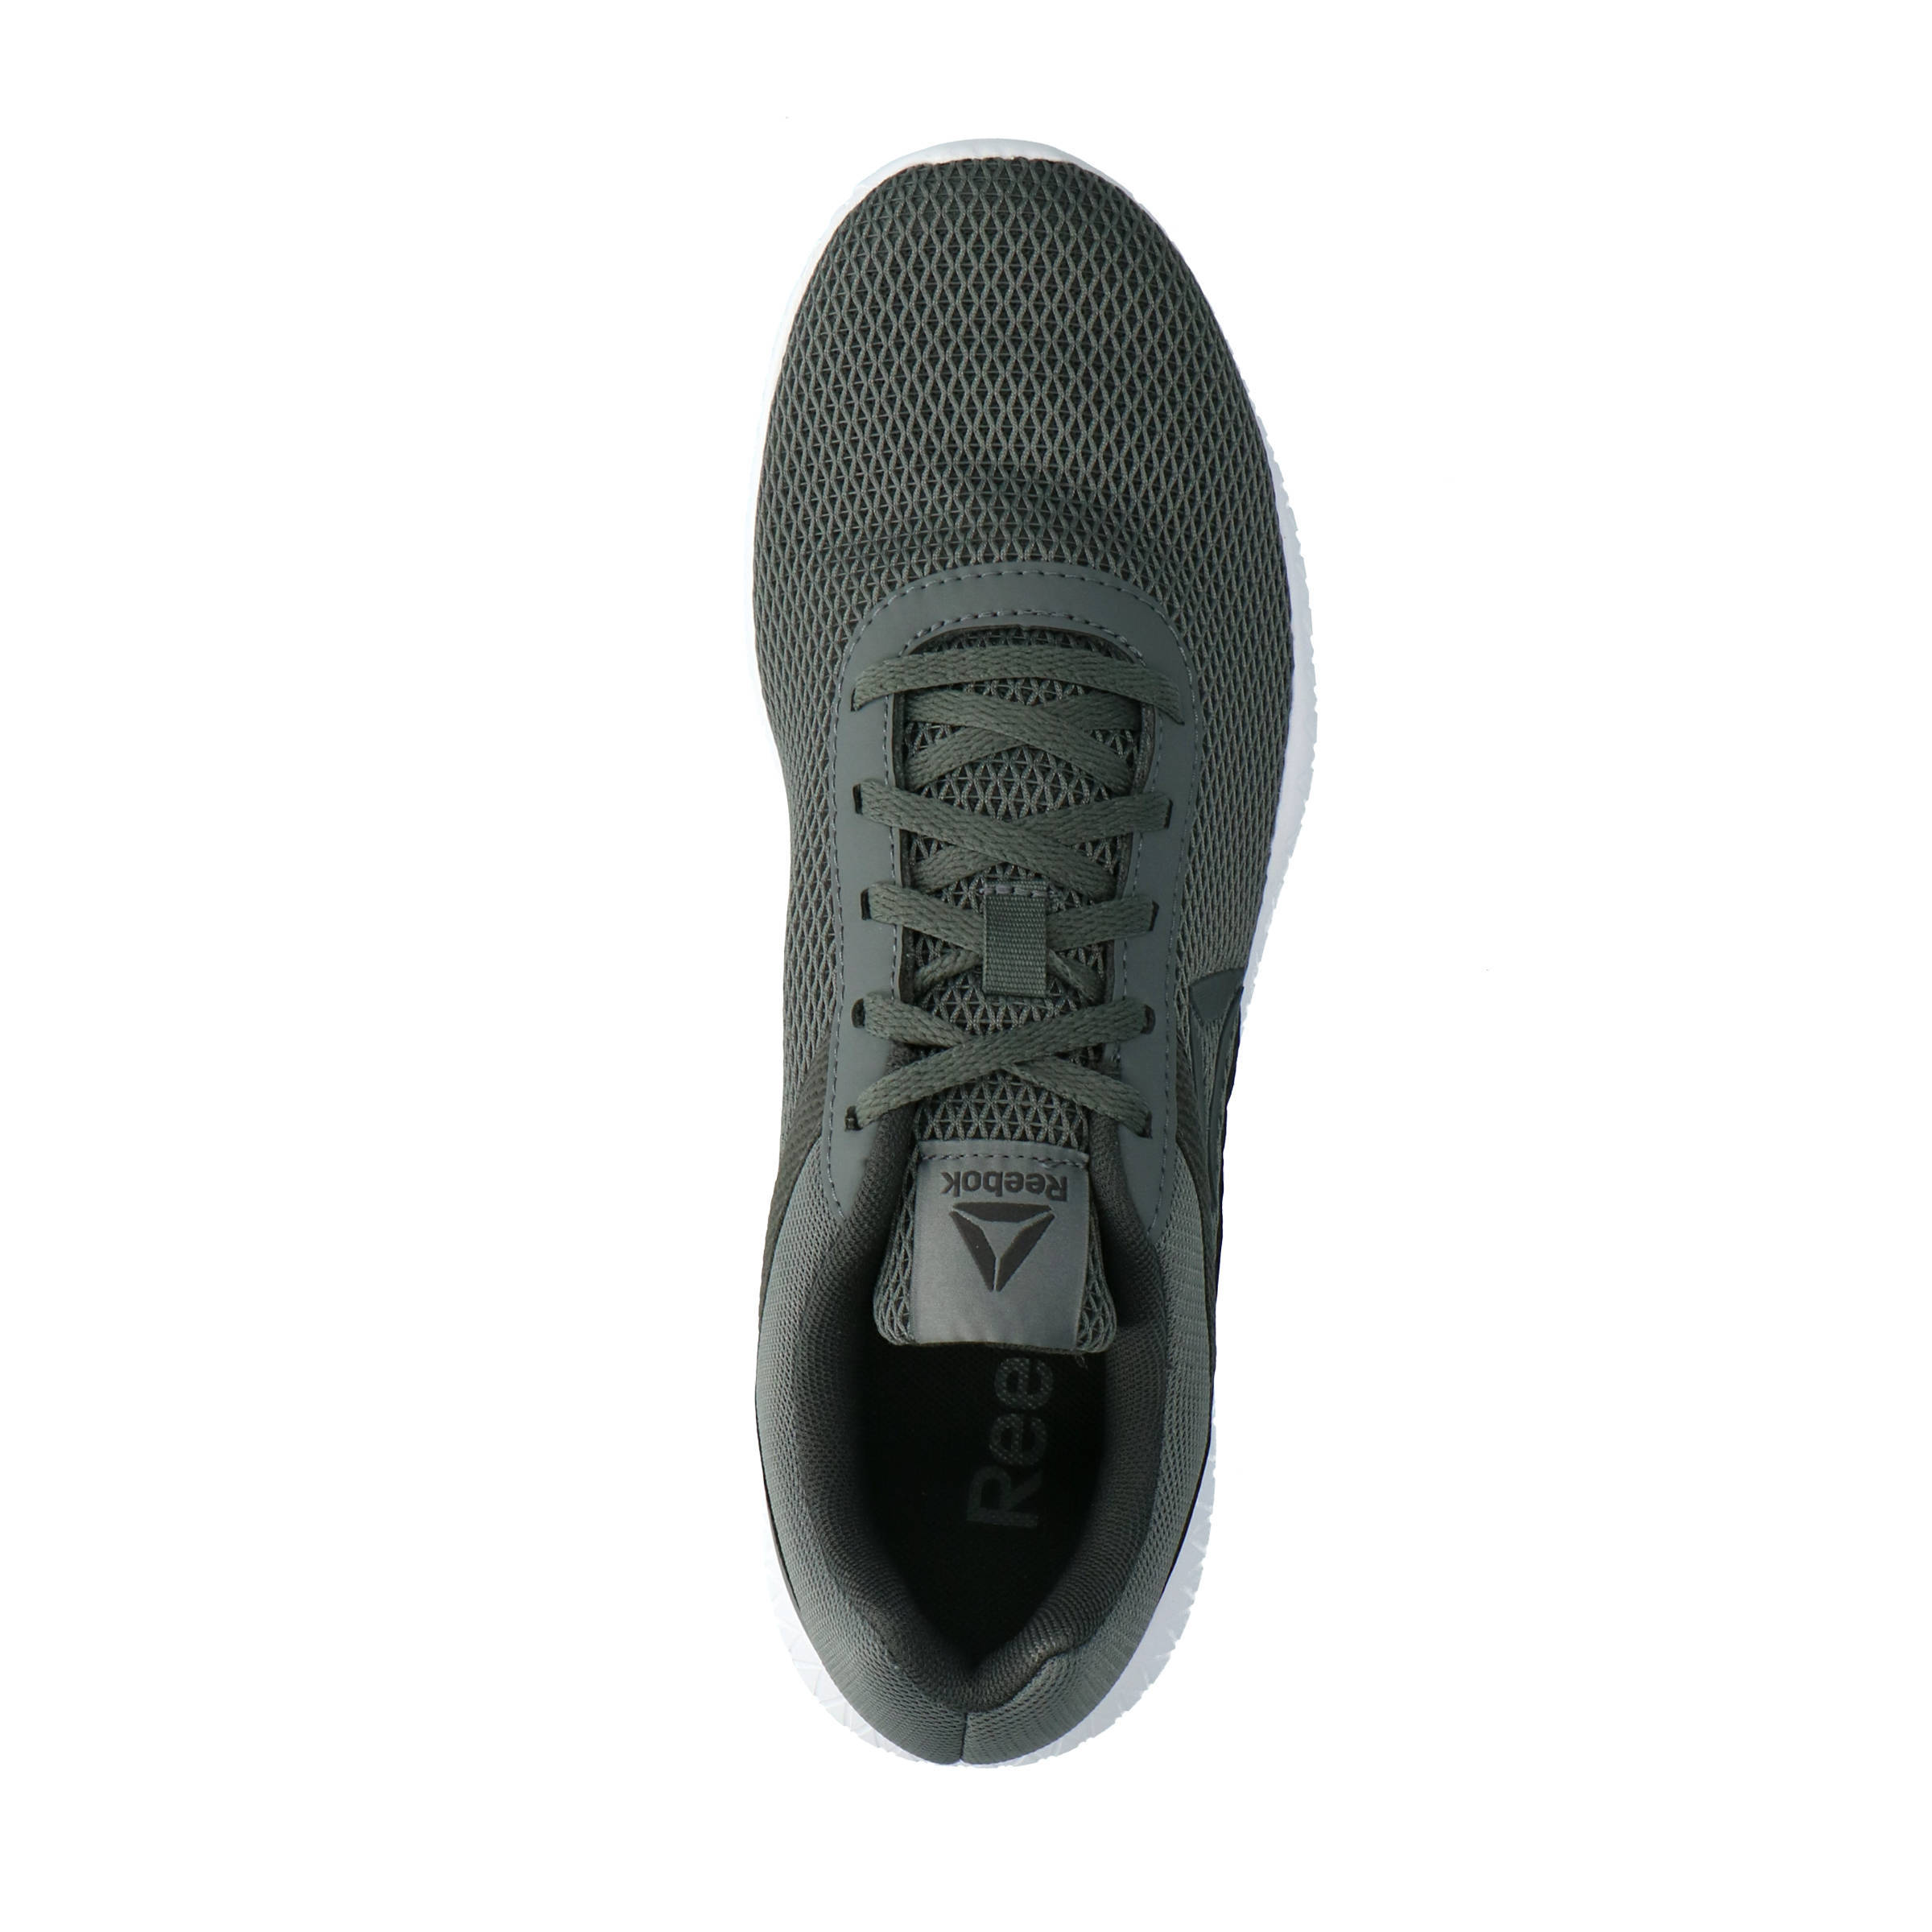 5bd35218a81 Reebok Flexagon Fit fitness schoenen grijs/antraciet | wehkamp